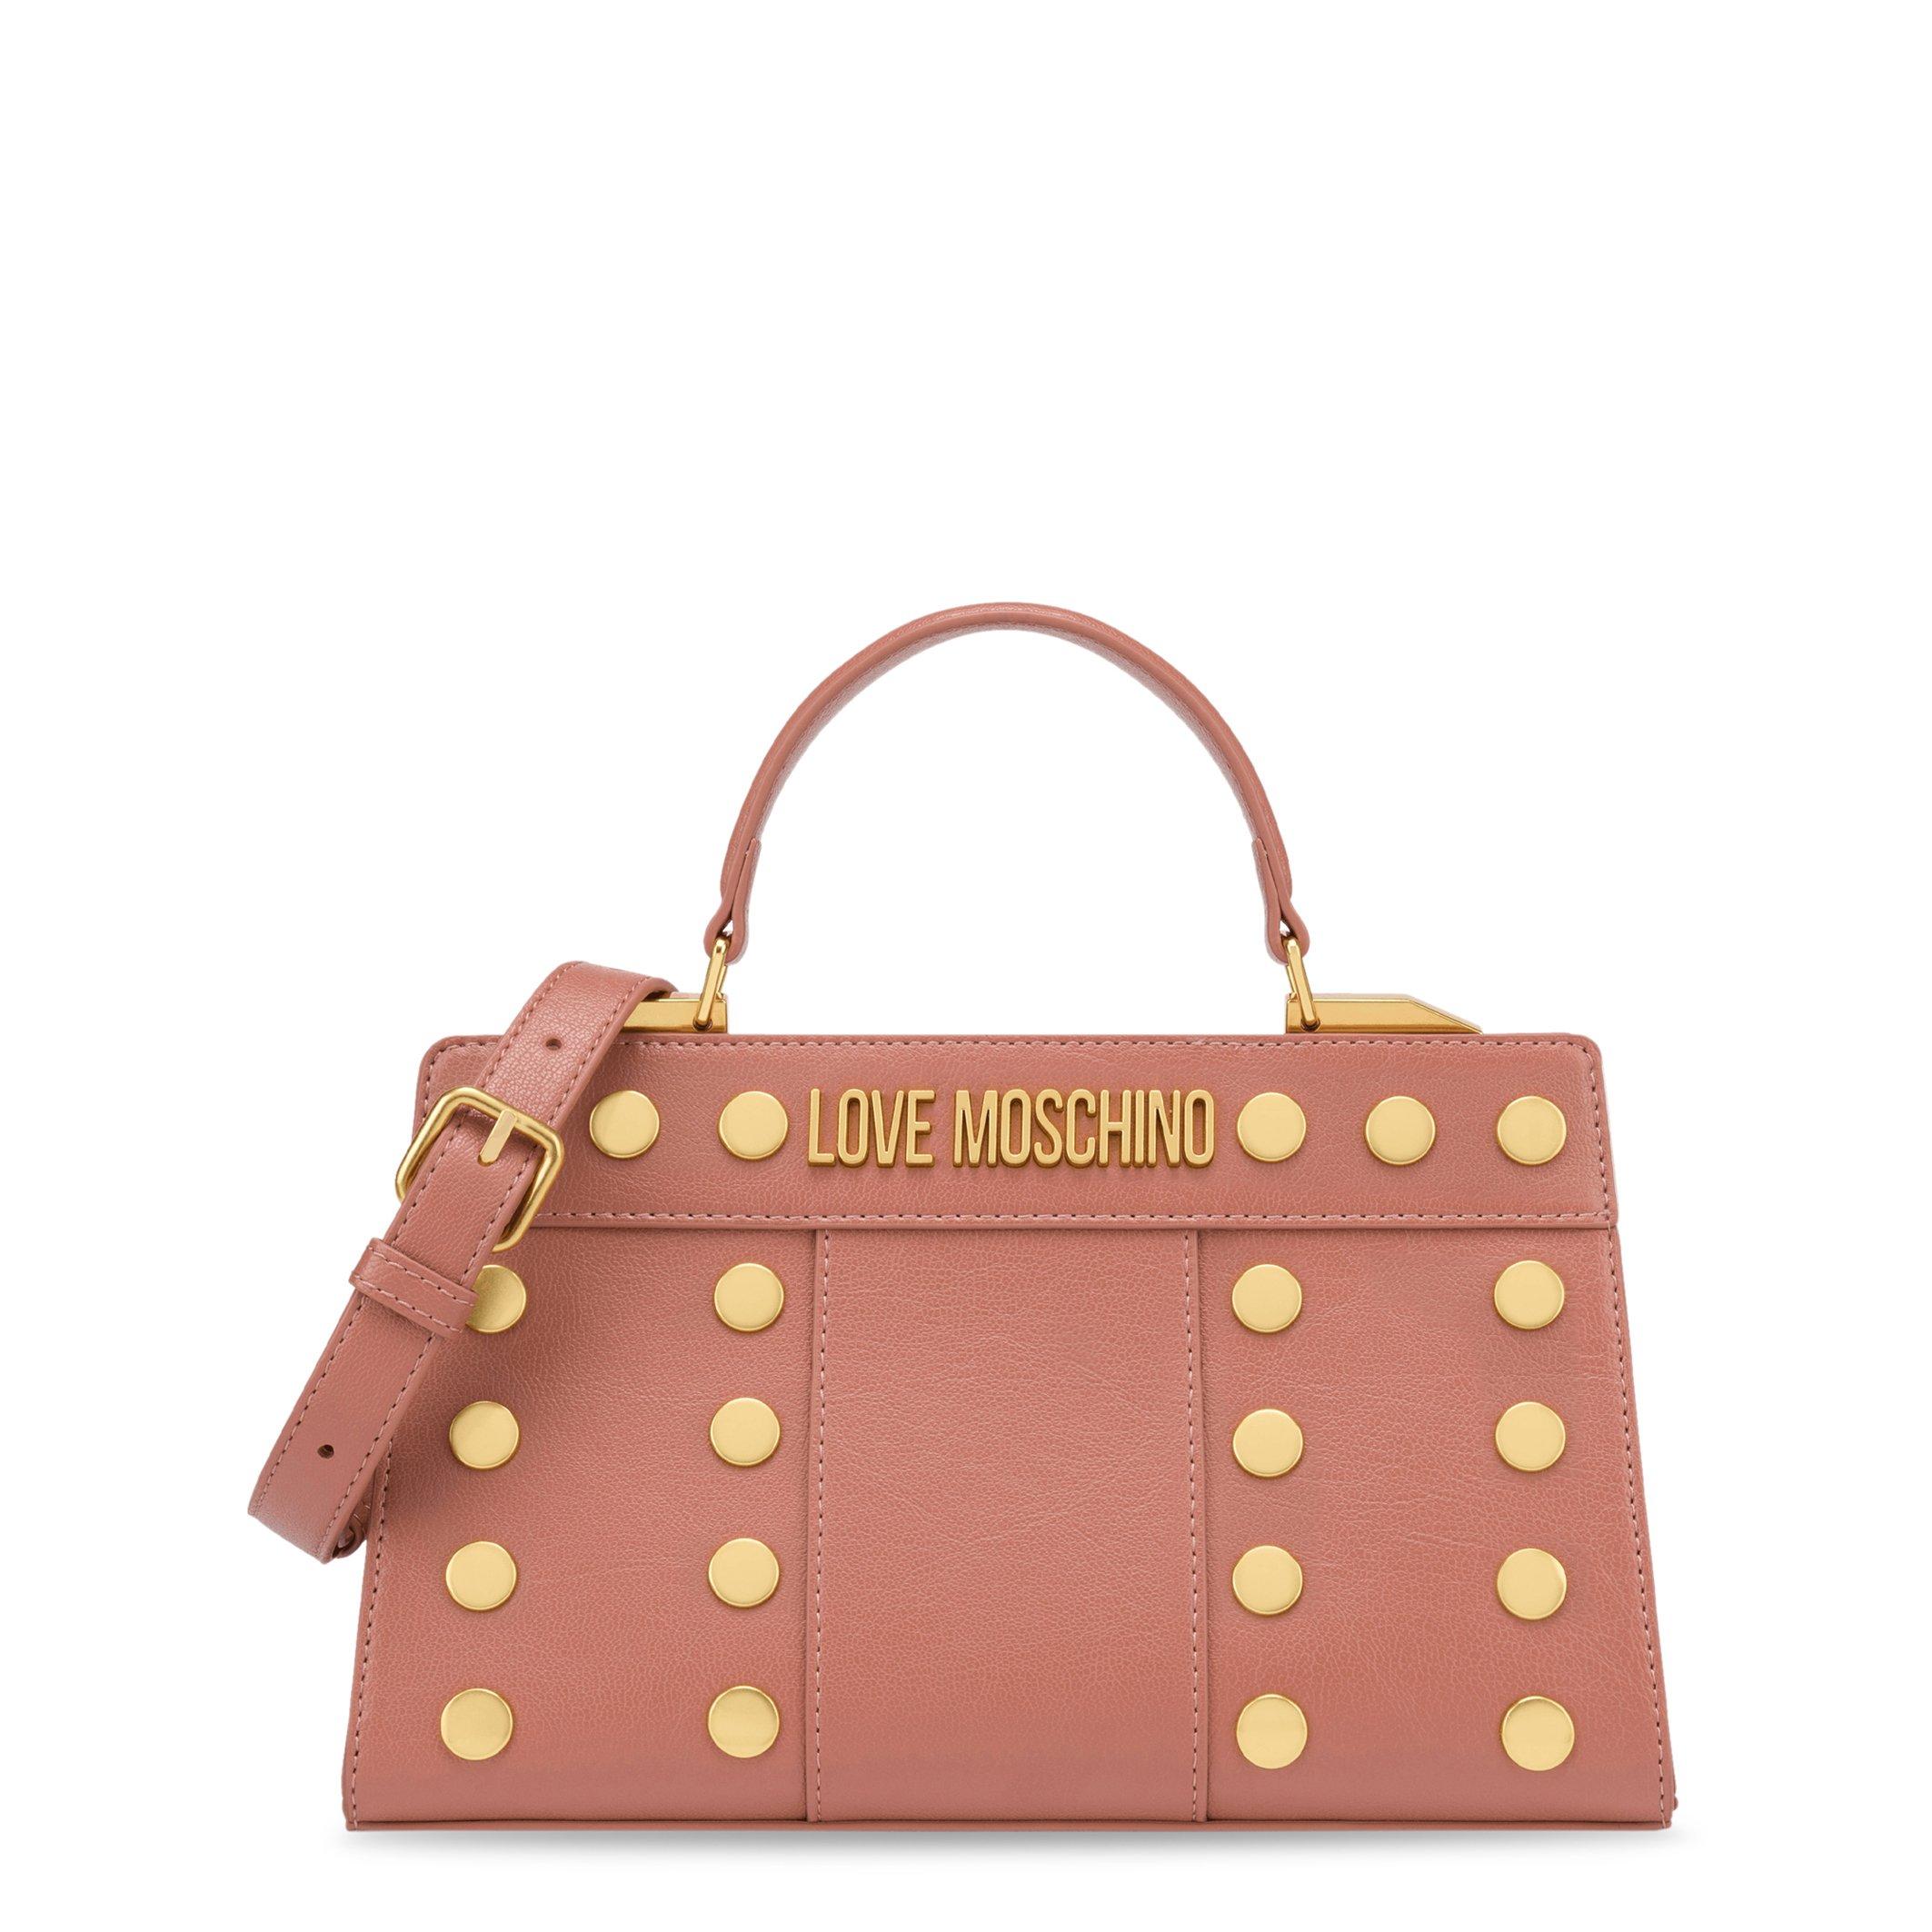 Love Moschino Women's Handbag Various Colours JC4219PP1DLM0 - pink NOSIZE